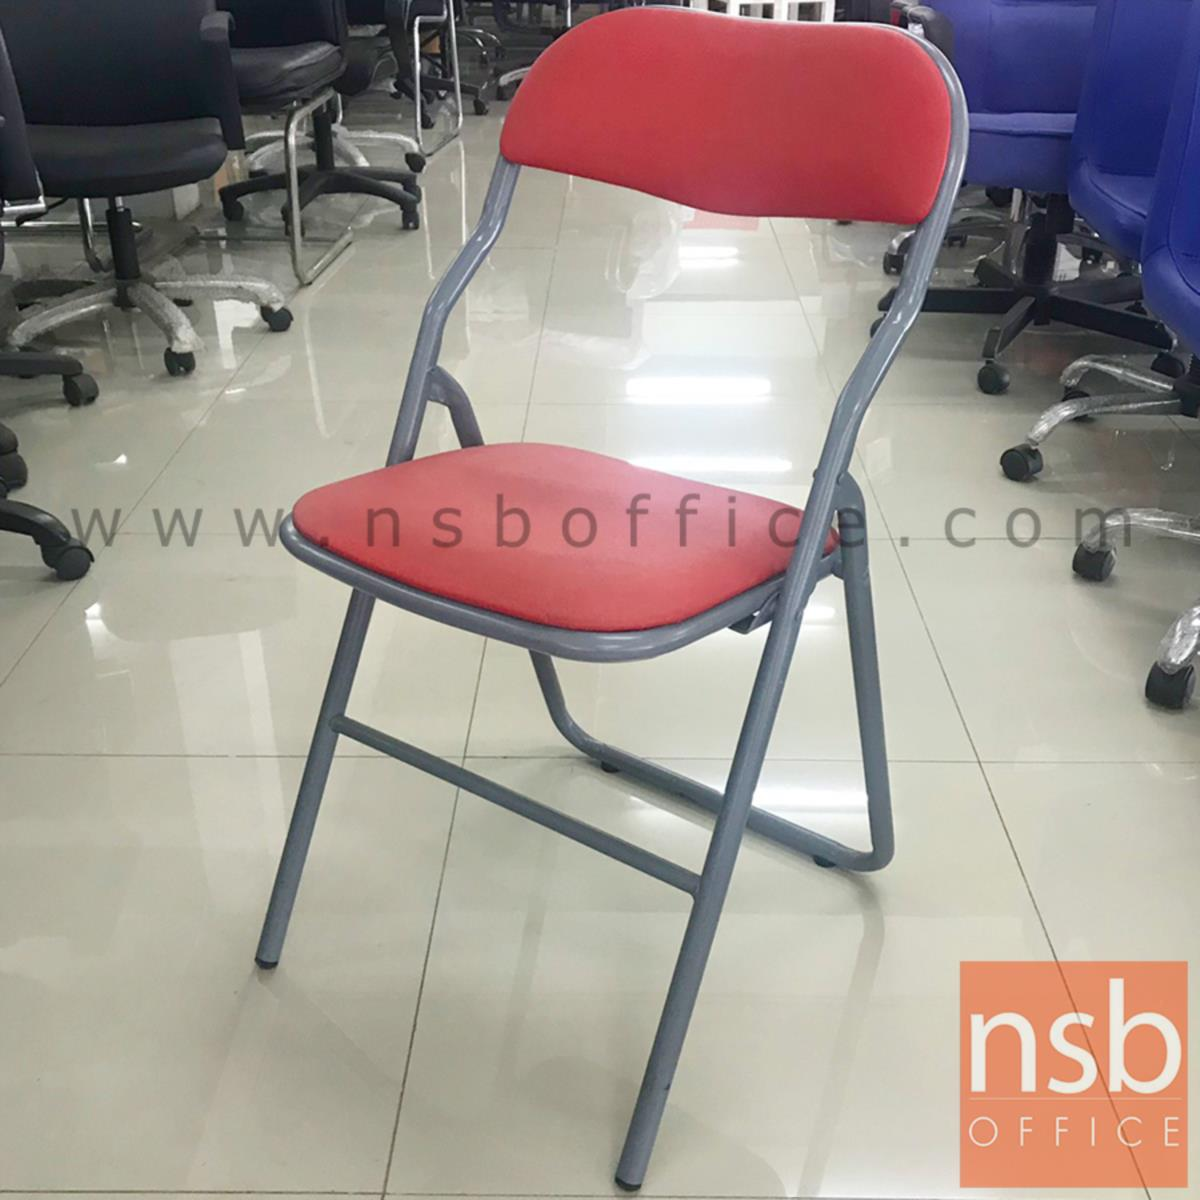 L02A297:เก้าอี้พับที่นั่งหุ้มเบาะหนัง รุ่น NSB-CHAIR11 ขนาด 38W*81H cm. โครงเหล็กสีเทา (STOCK-2 ตัว)